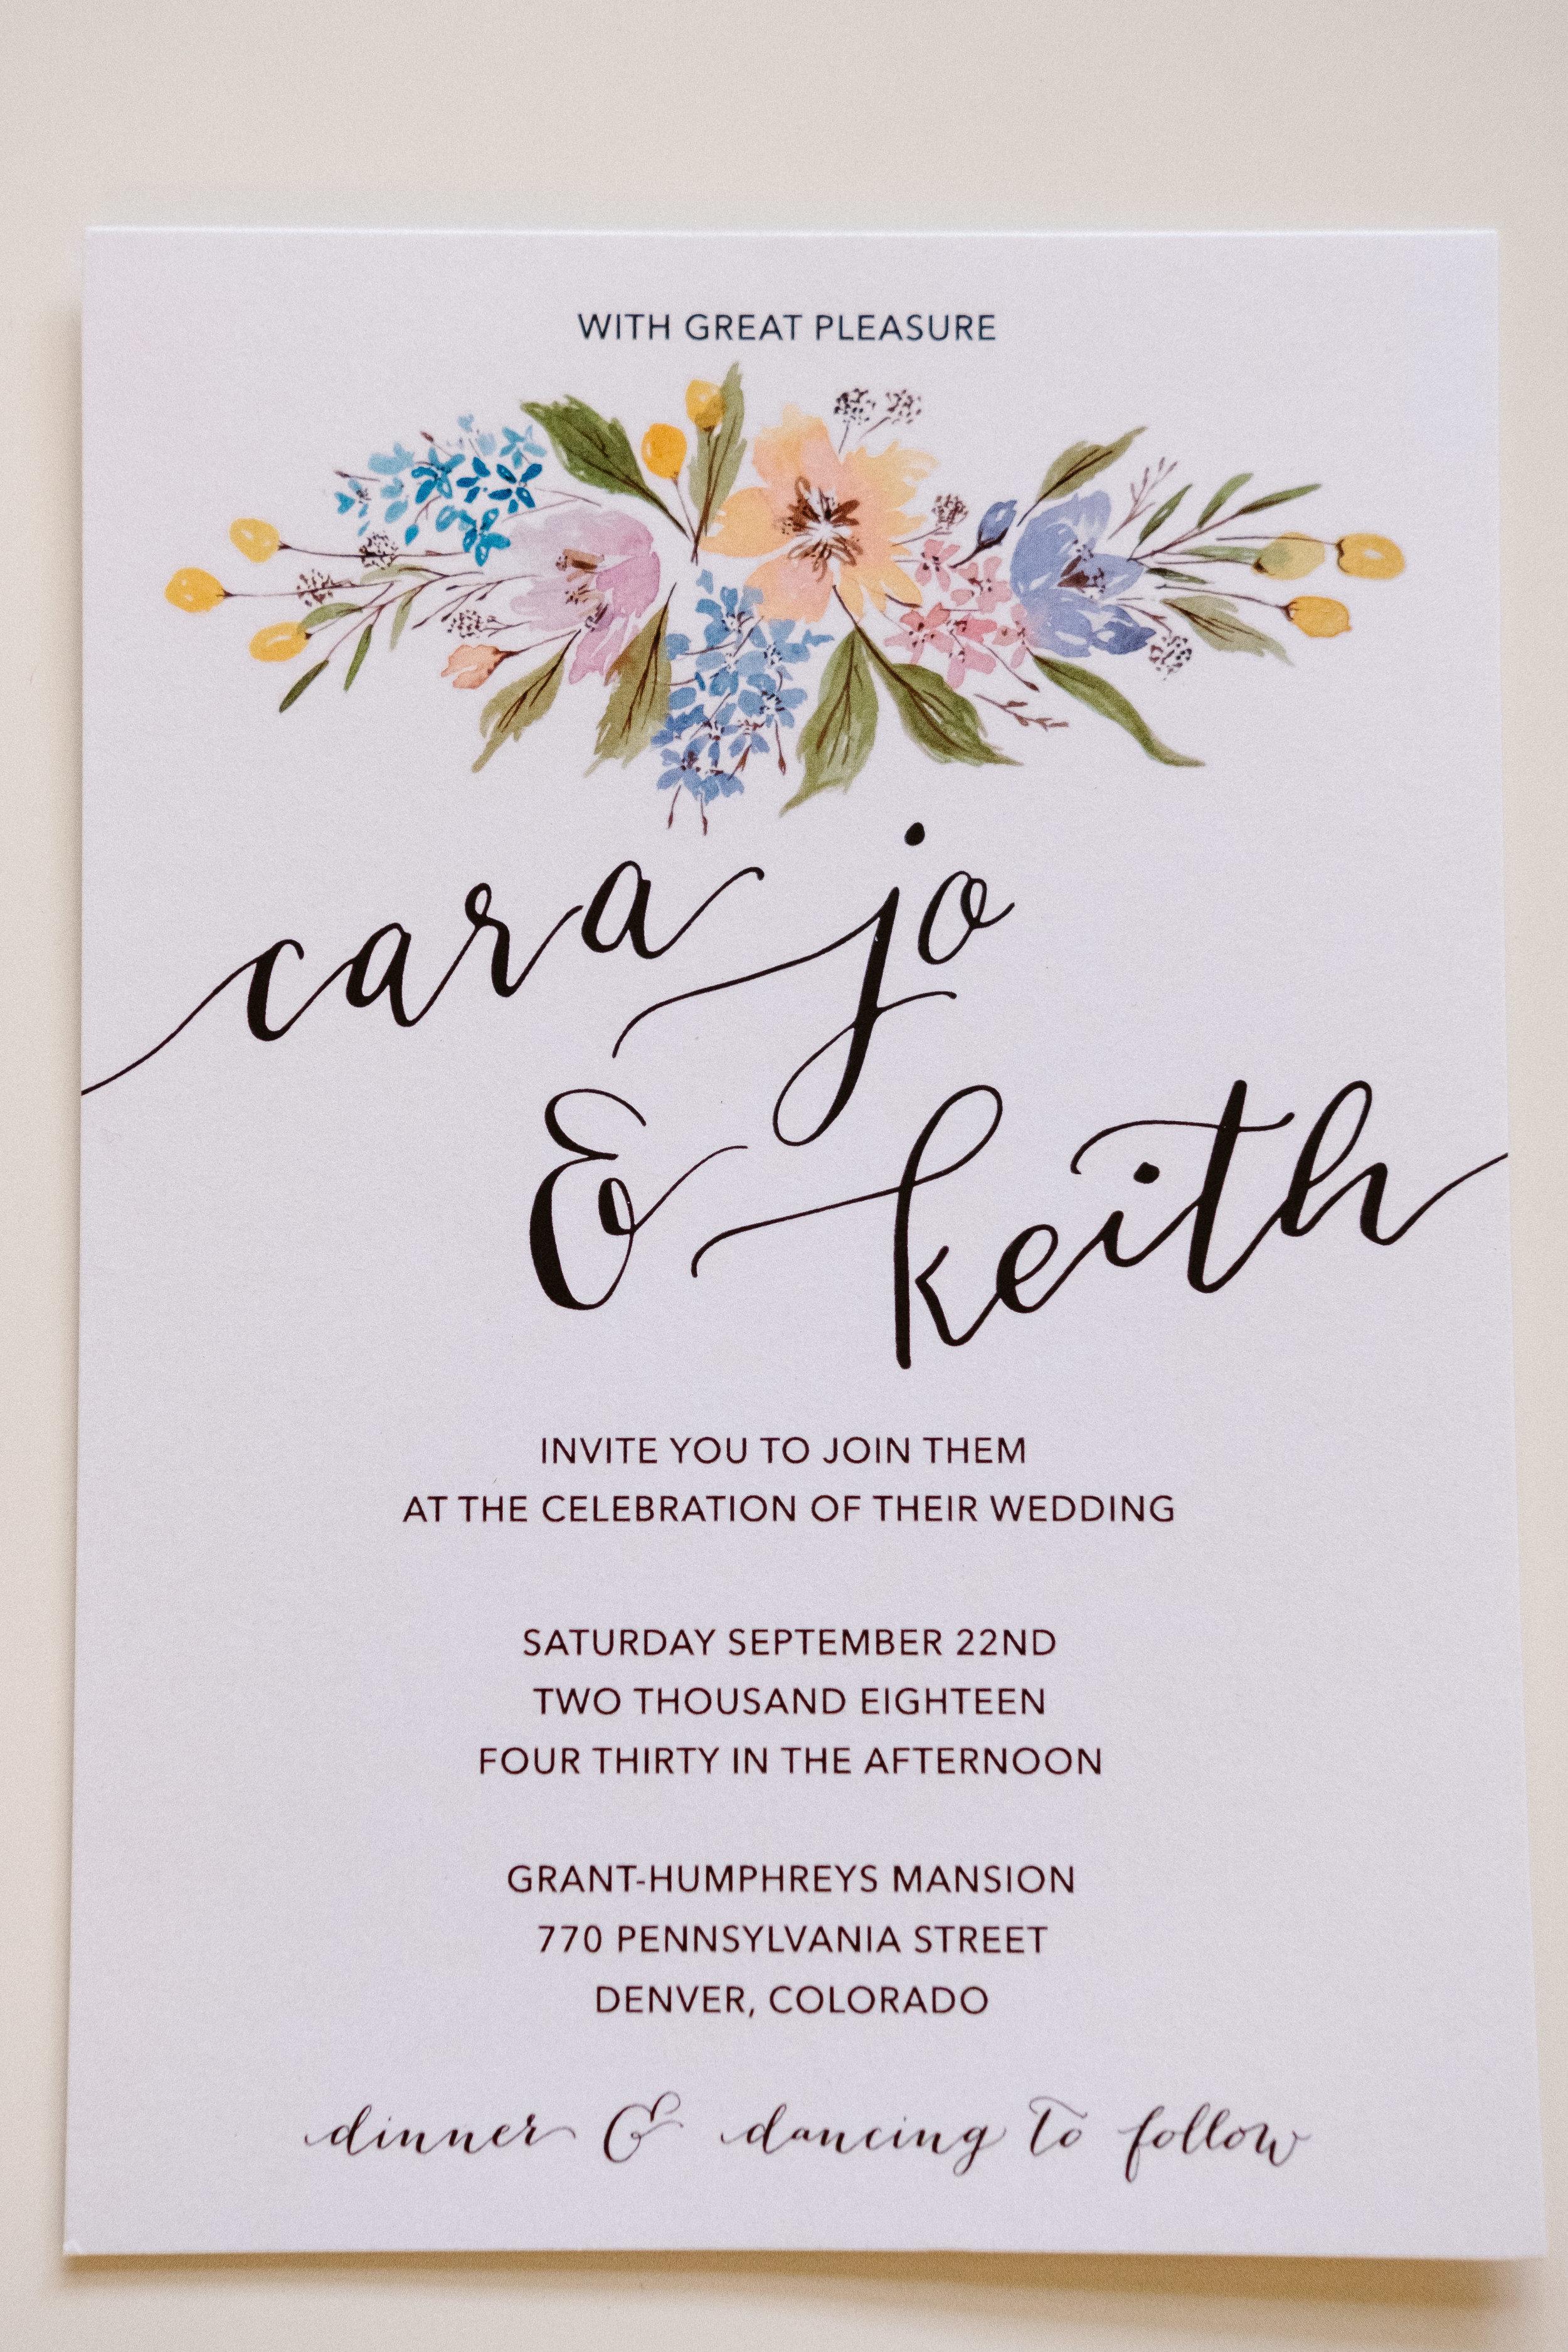 cara-jo-keith-grant-humphreys-mansion-wedding-7-91.jpg